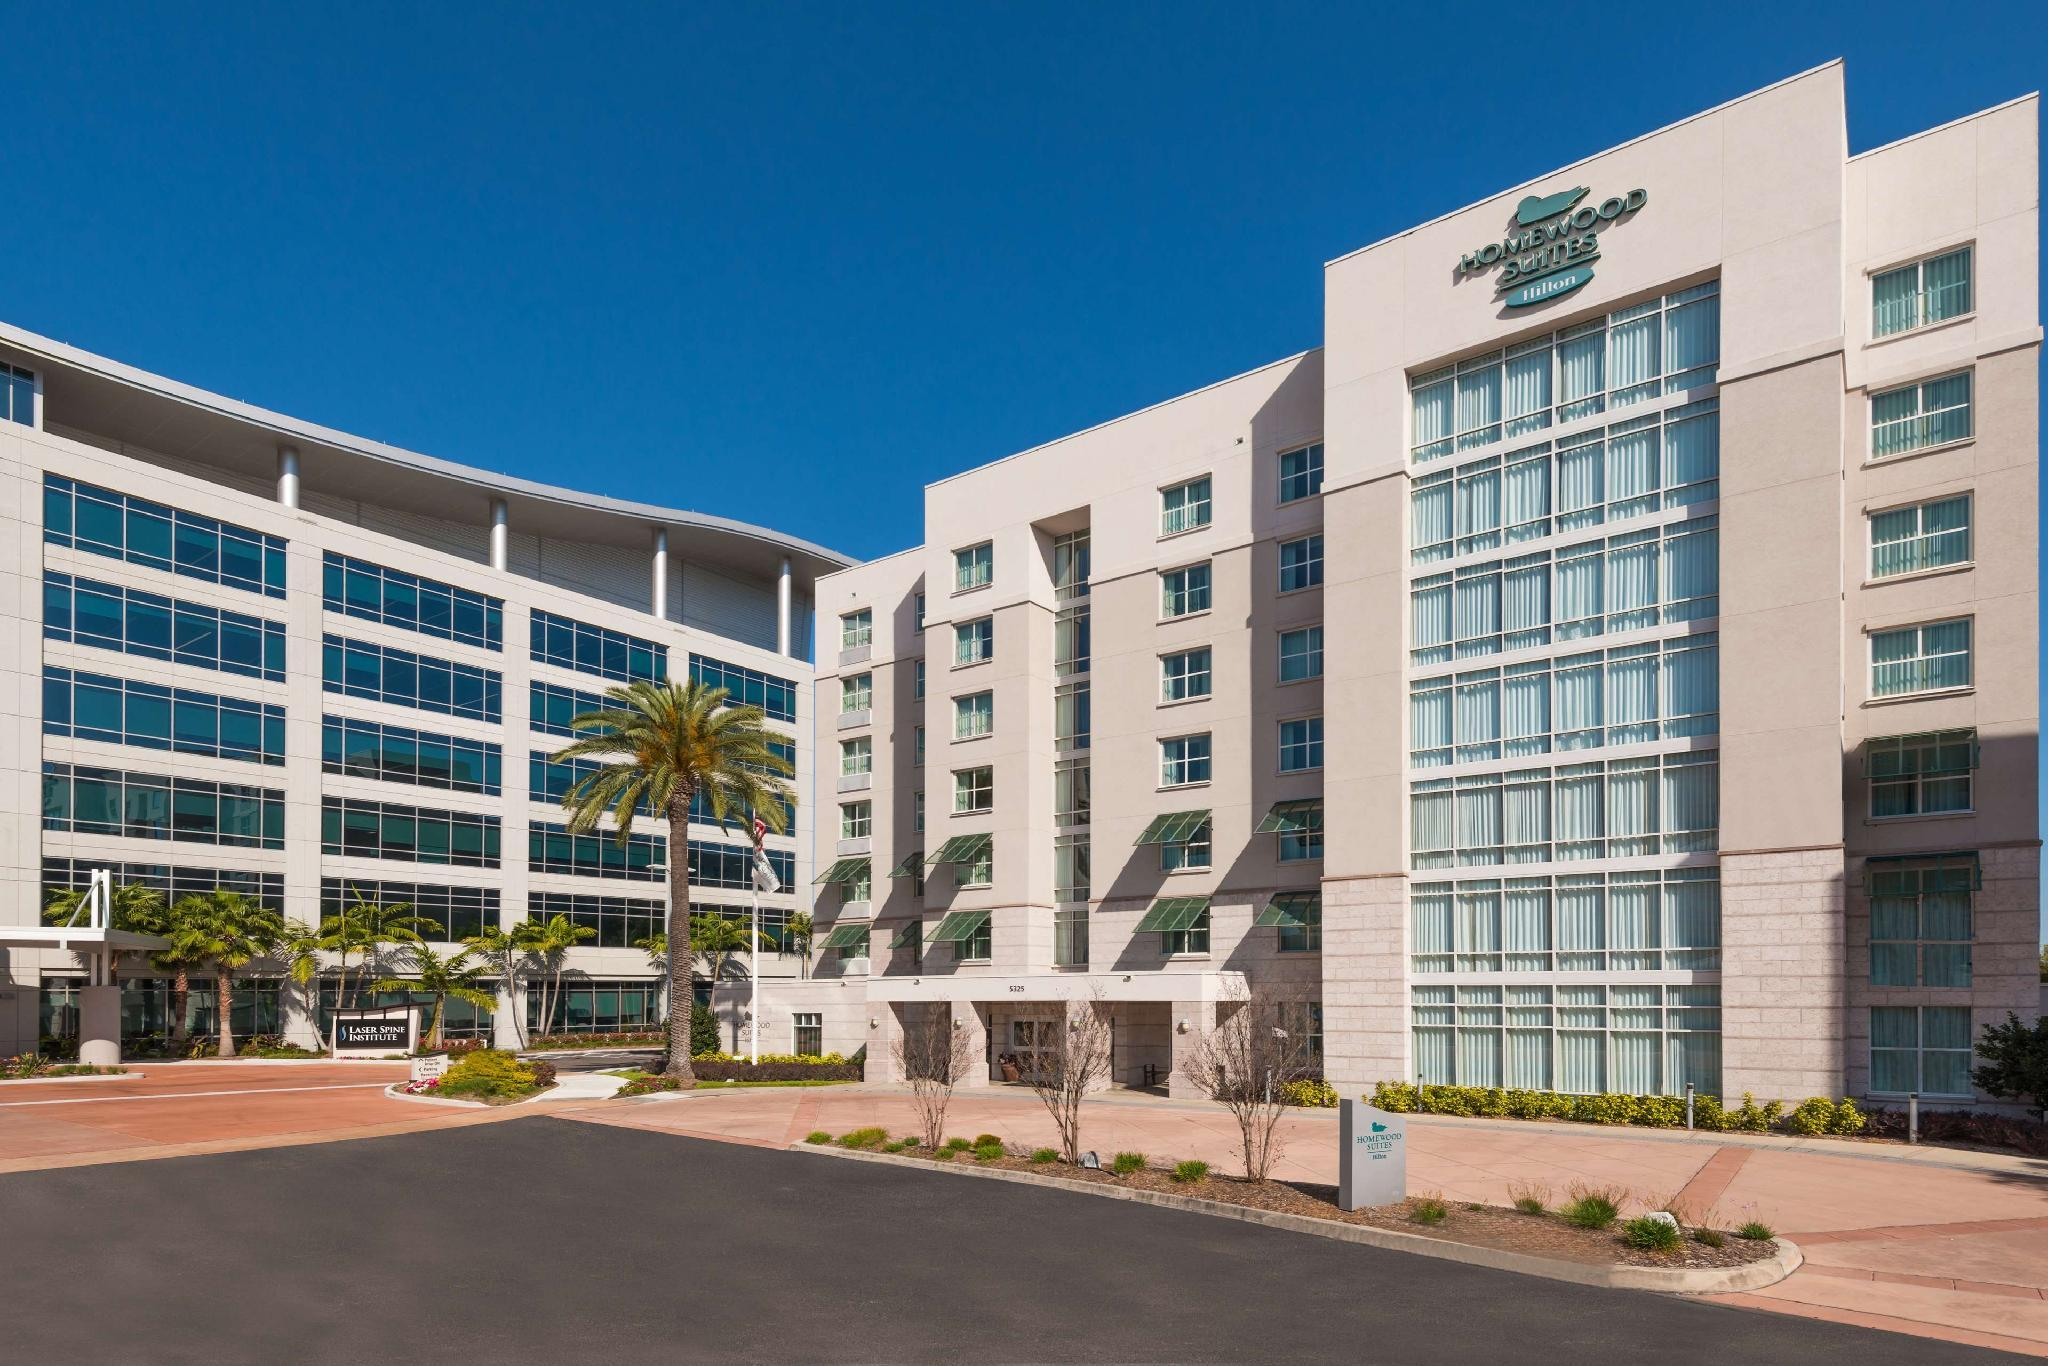 Homewood Suites By Hilton Tampa Airport Westshore Hotel